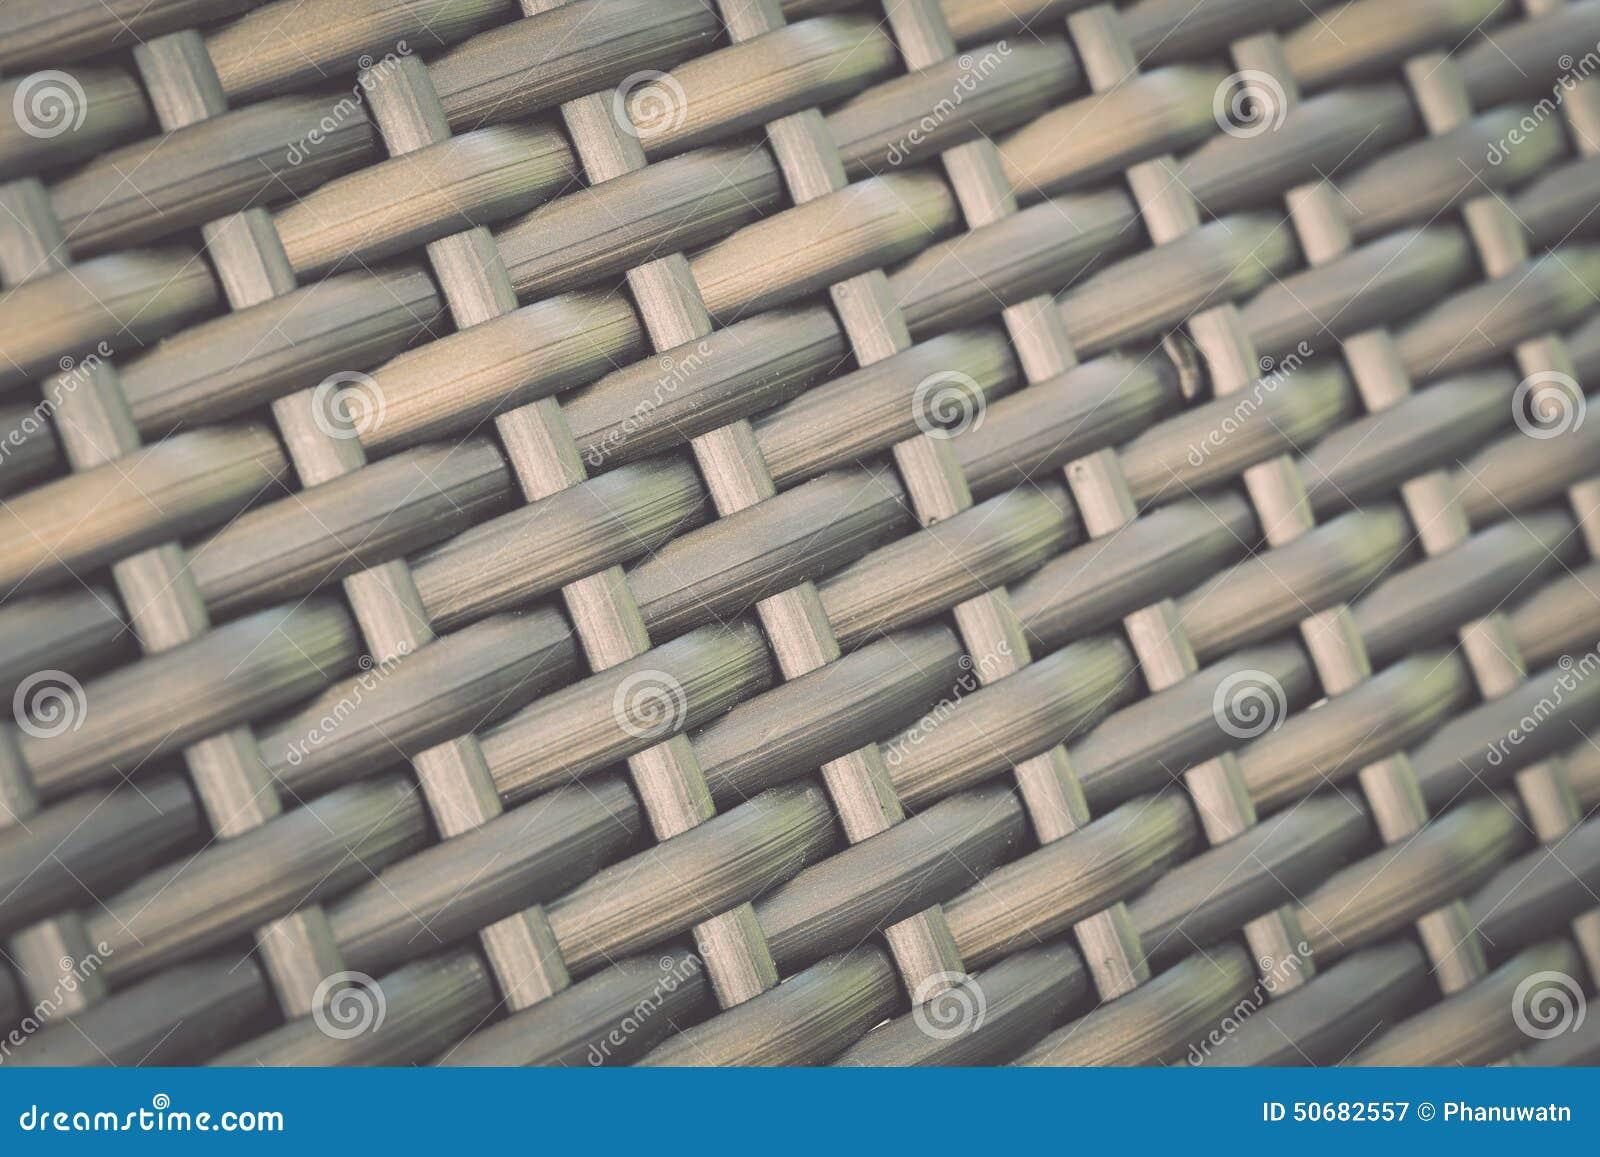 Download 背景的塑料样式 库存图片. 图片 包括有 装饰, 装饰图案, 墙纸, 材料, 抽象, 织地不很细, 波儿地克的 - 50682557